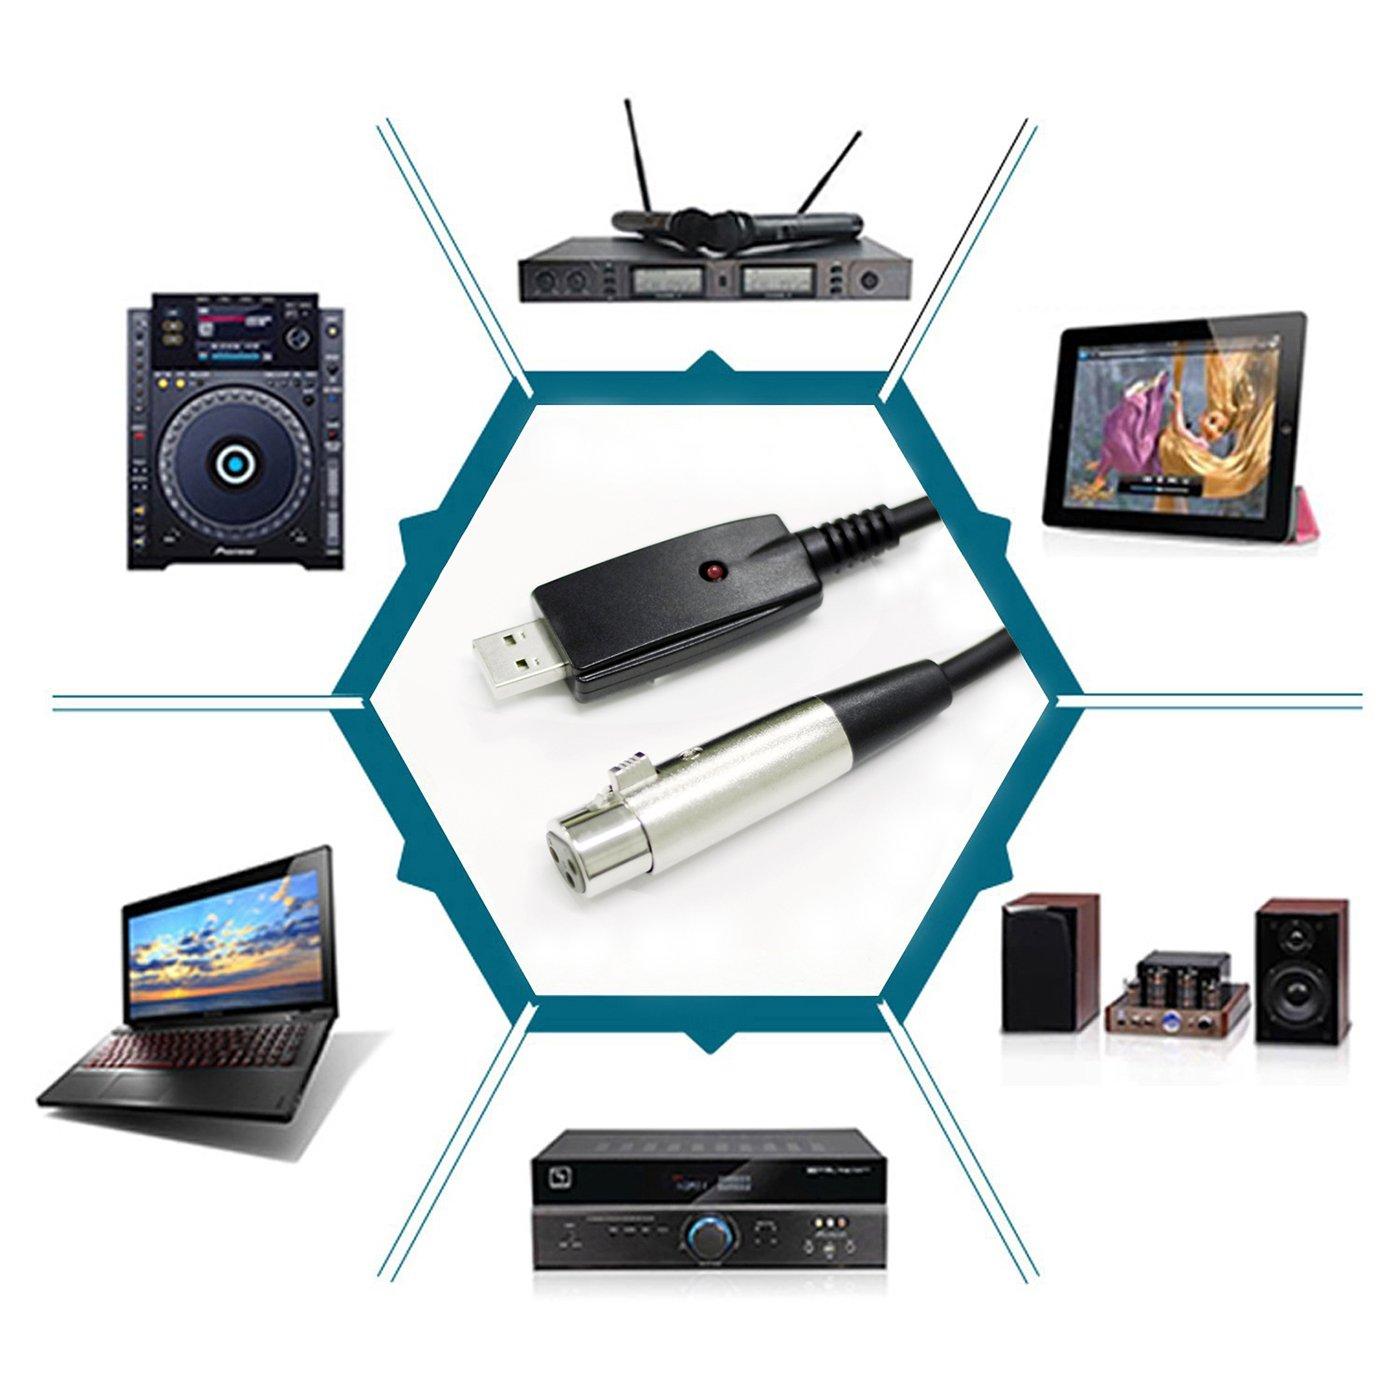 LoongGate Cable de micr/ófono USB a XLR 3 pines USB macho a XLR Cable de conversor de enlace de micr/ófono femenino Cable de audio de Studio Cable de conexi/ón Adaptador para micr/ófonos o instrumentos Grabaci/ón Canto de ka